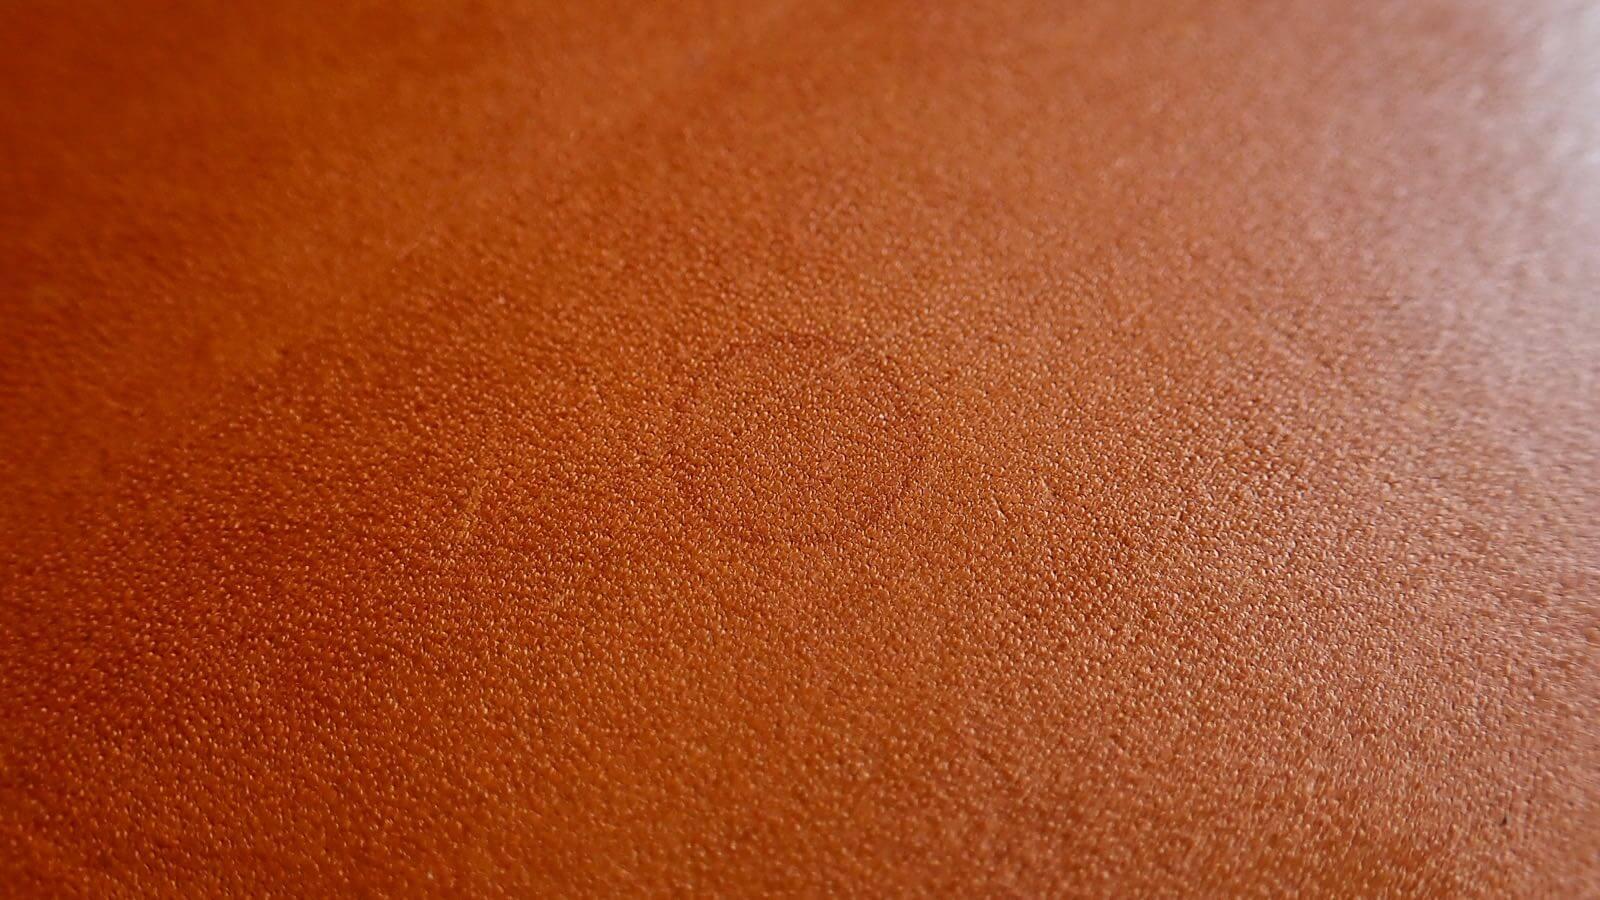 0110 Mikasa Leather Desk Matte Review 16